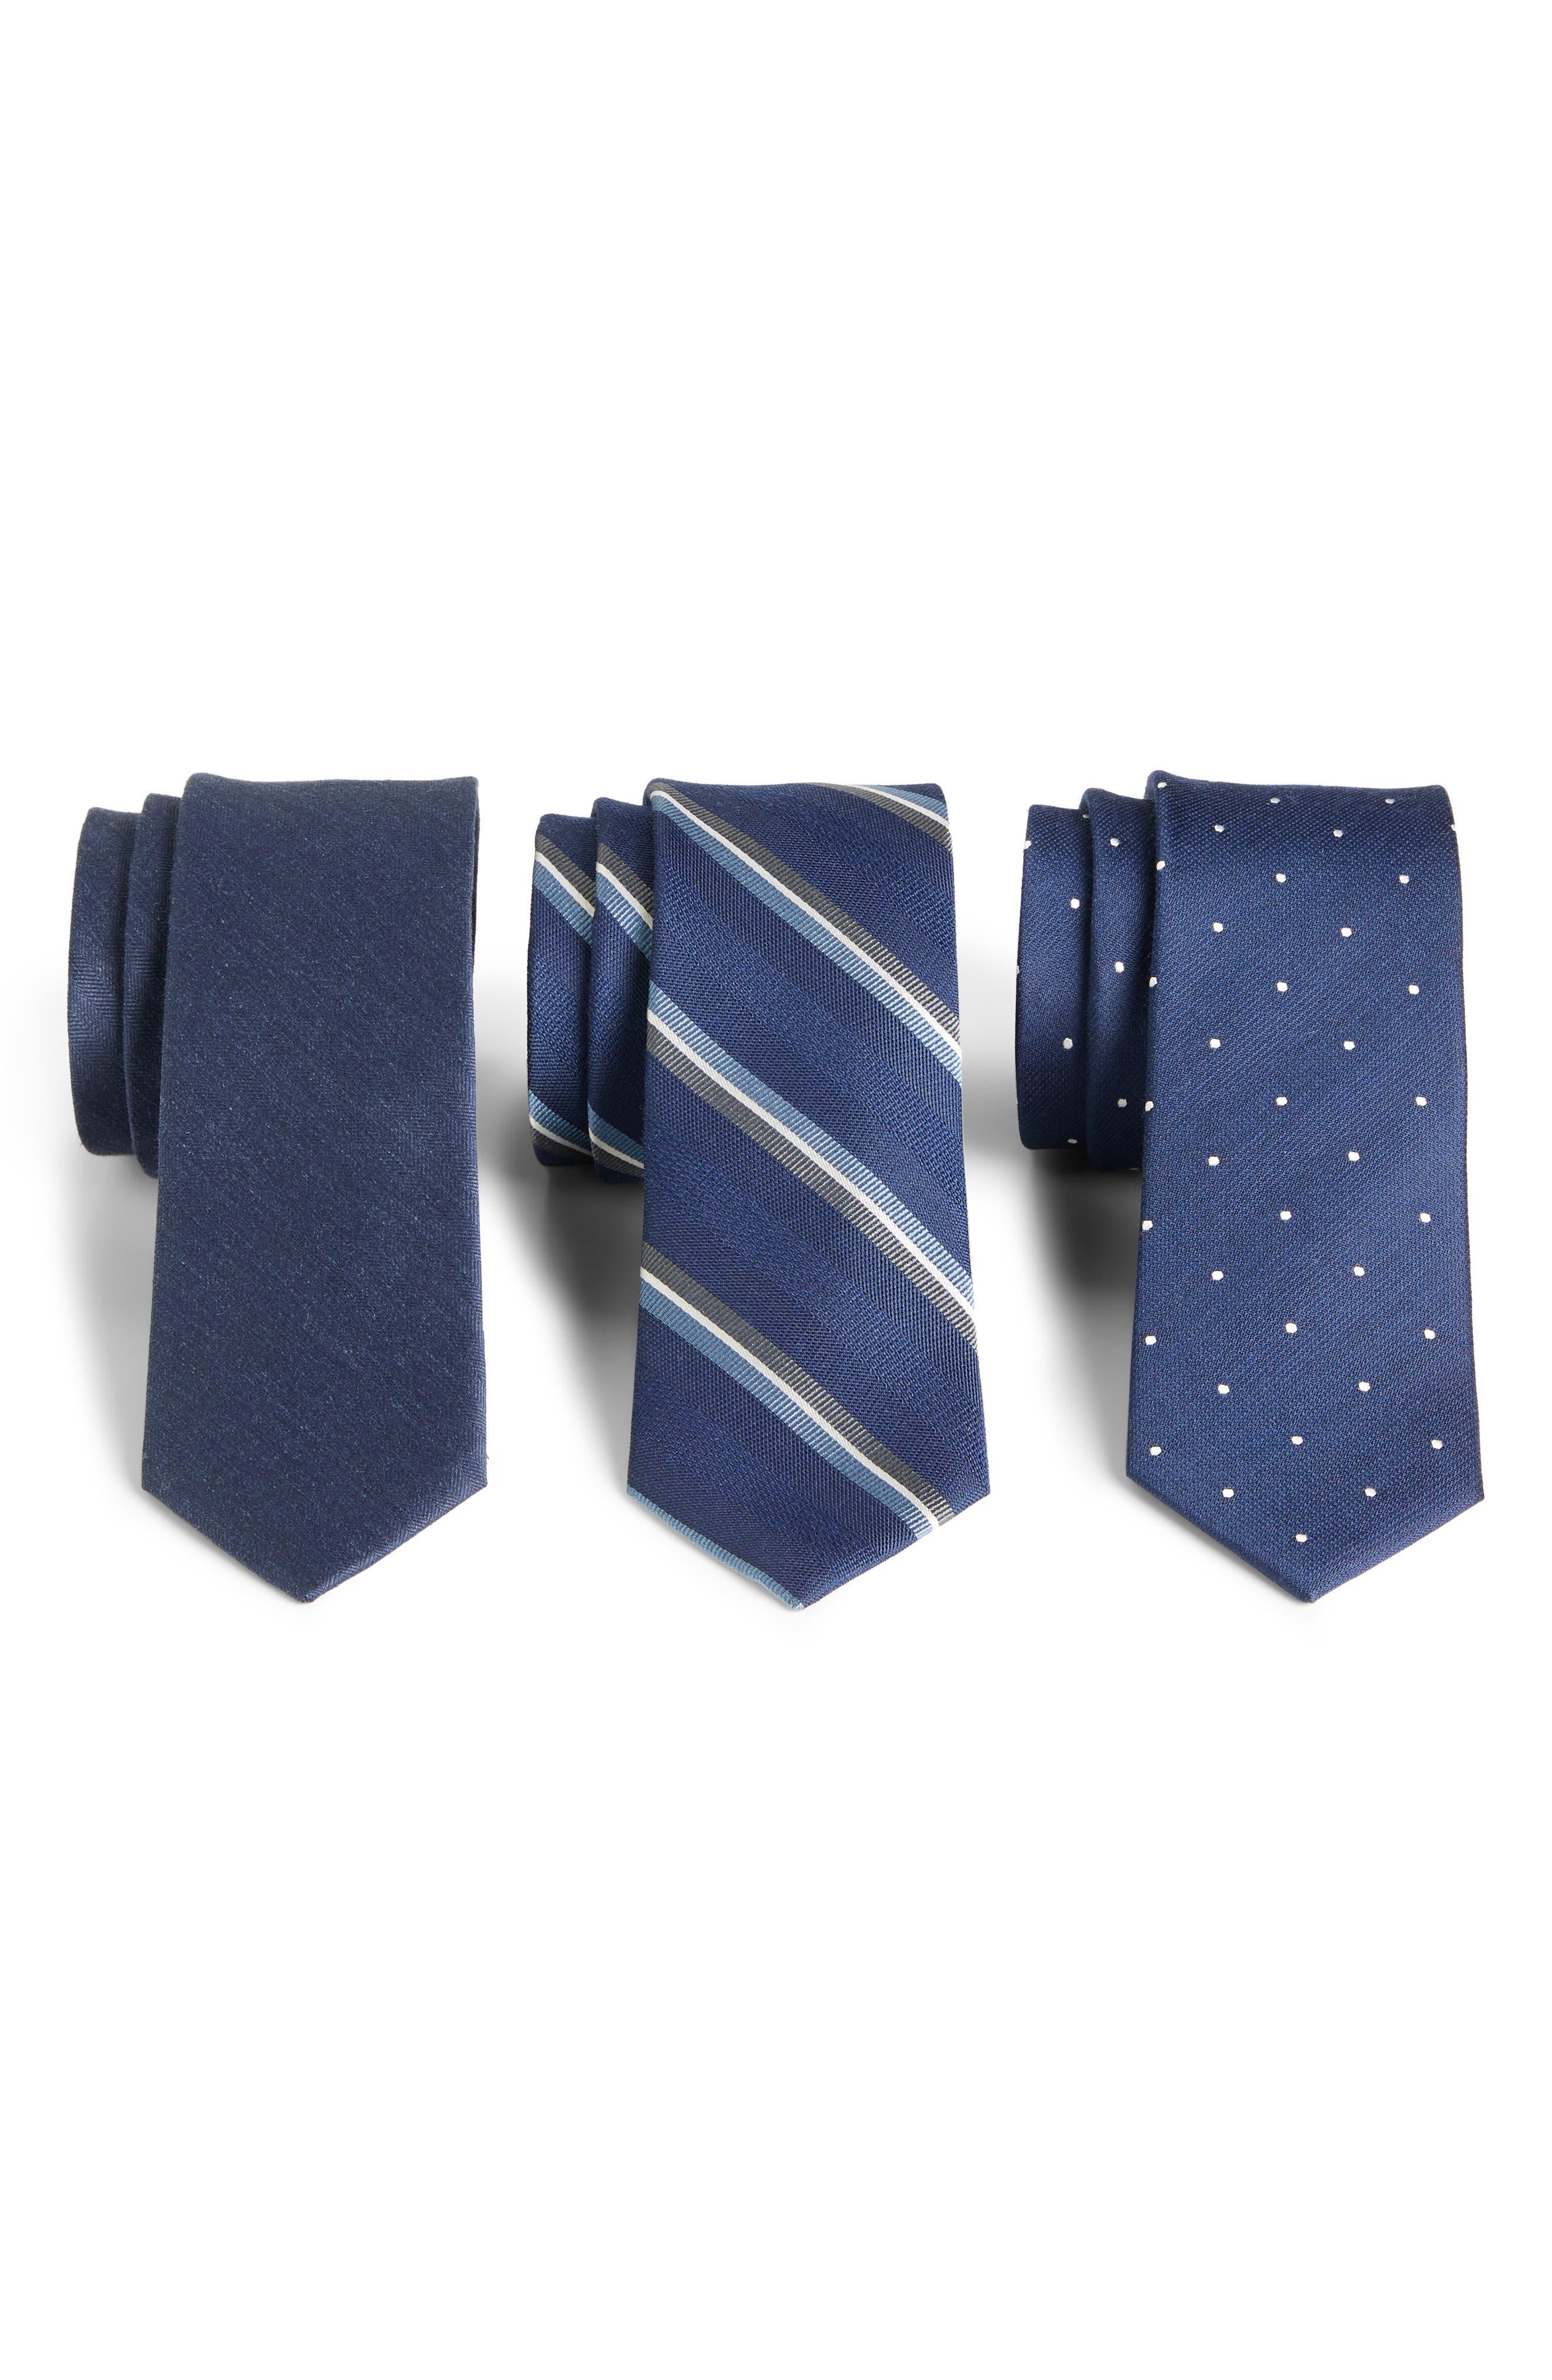 THE TIE BAR 3-Pack Navy Tie Set, Main, color, NAVY